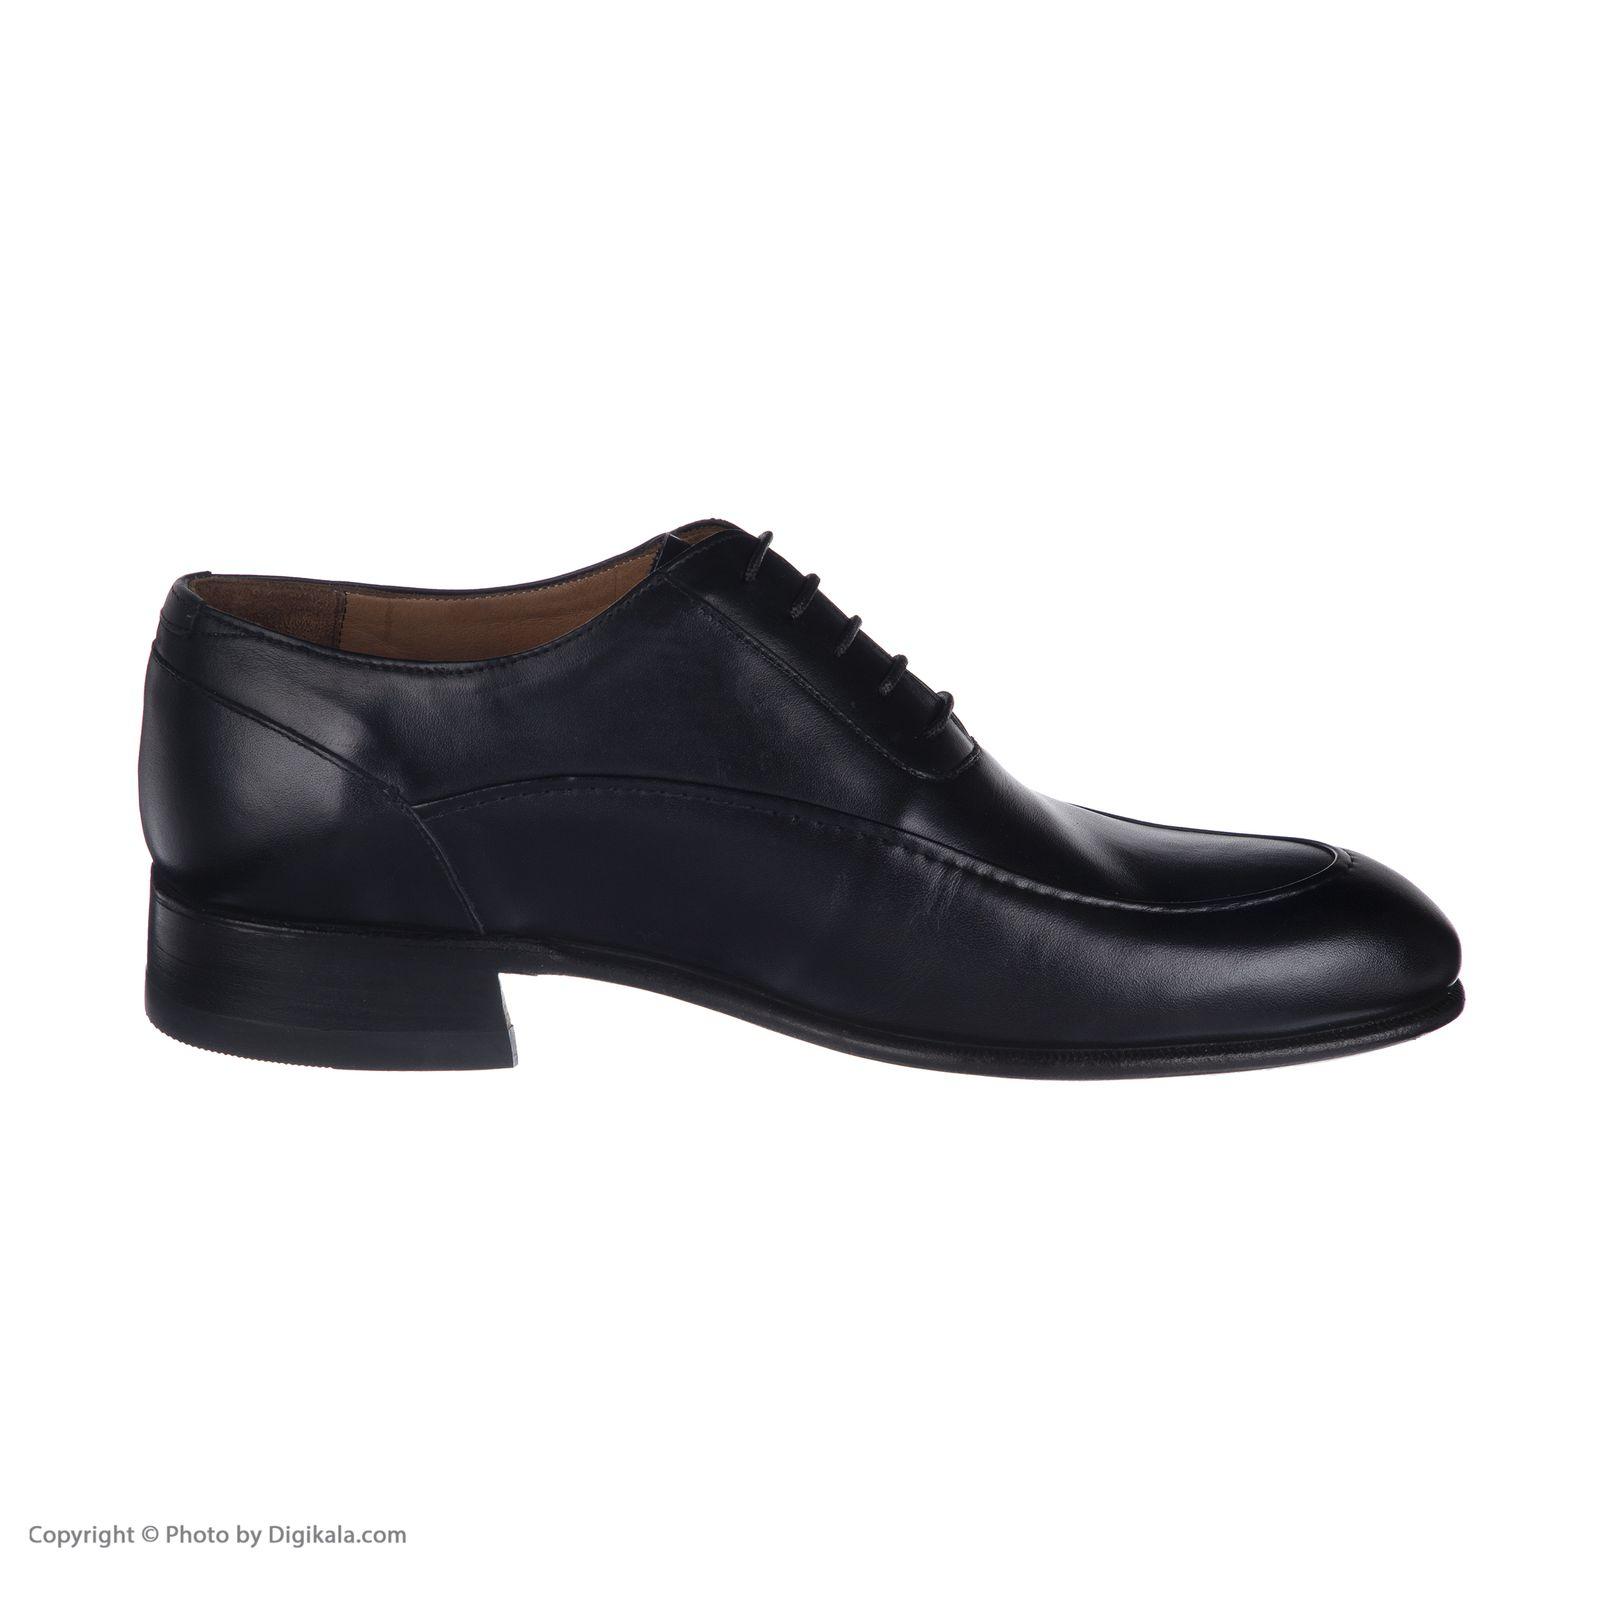 کفش مردانه نظری کد 425 -  - 2